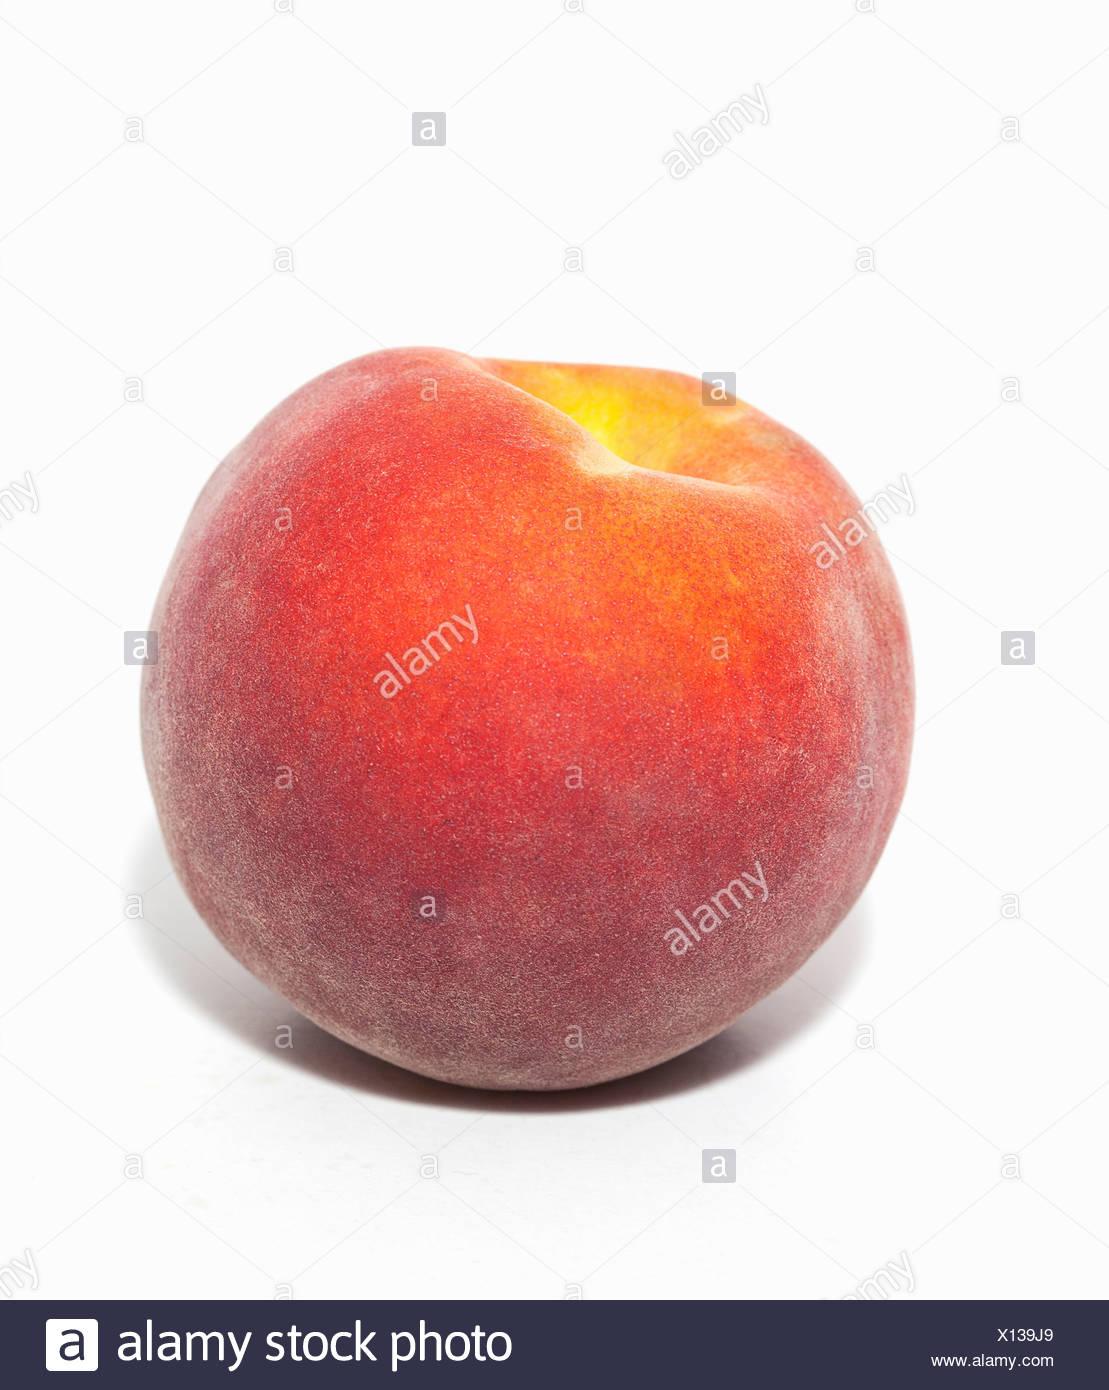 Whole peach - Stock Image